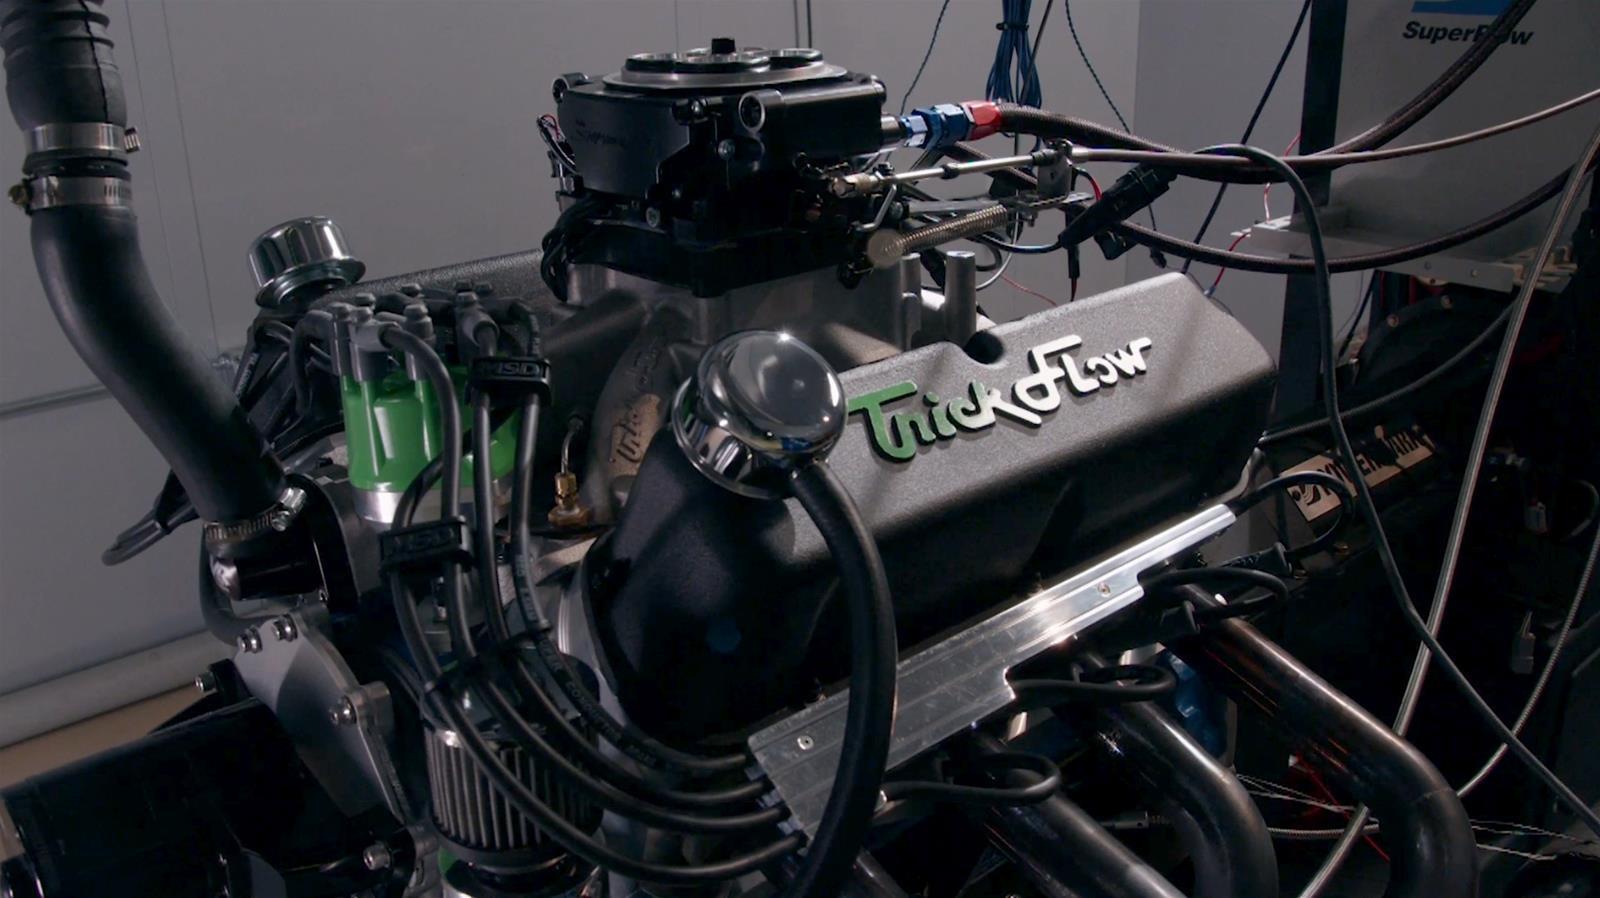 BMR Racing Endurance Racing 363 ci Ford V8